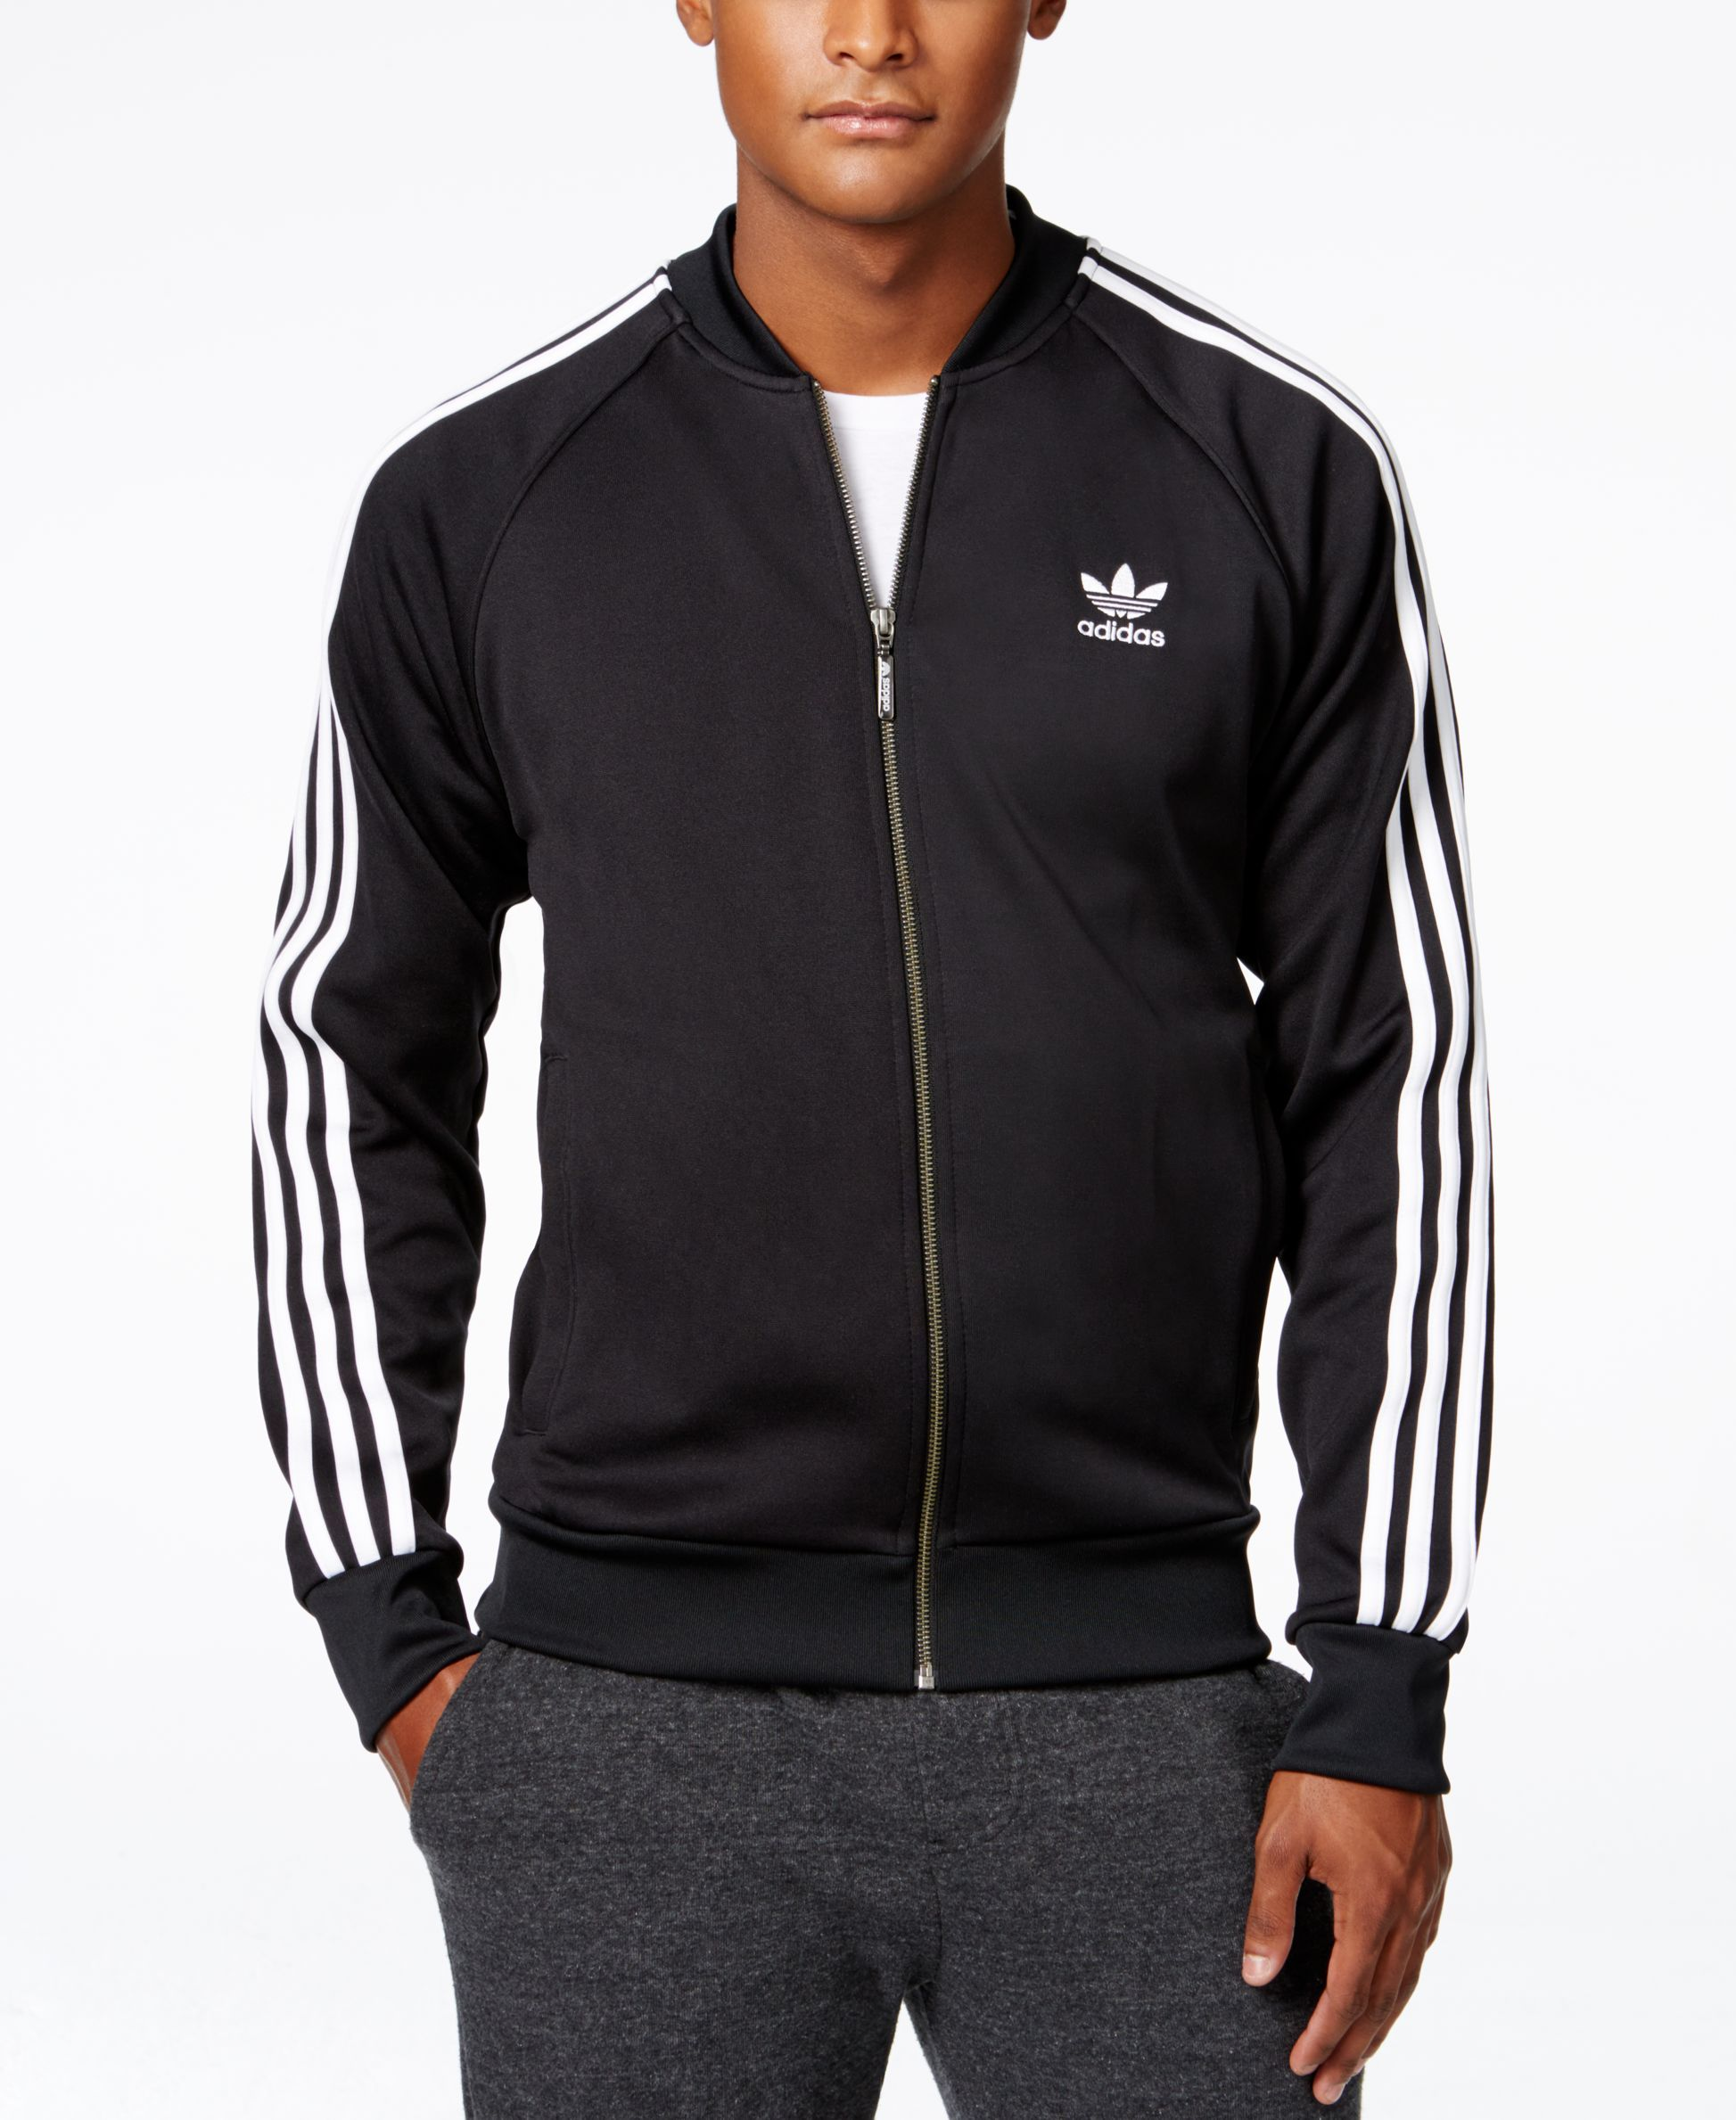 Adidas Originals Men S Superstar Track Jacket Hoodies Sweatshirts Men Macy S Adidas Originals Jacket Adidas Jacket Mens Mens Sweatshirts Hoodie